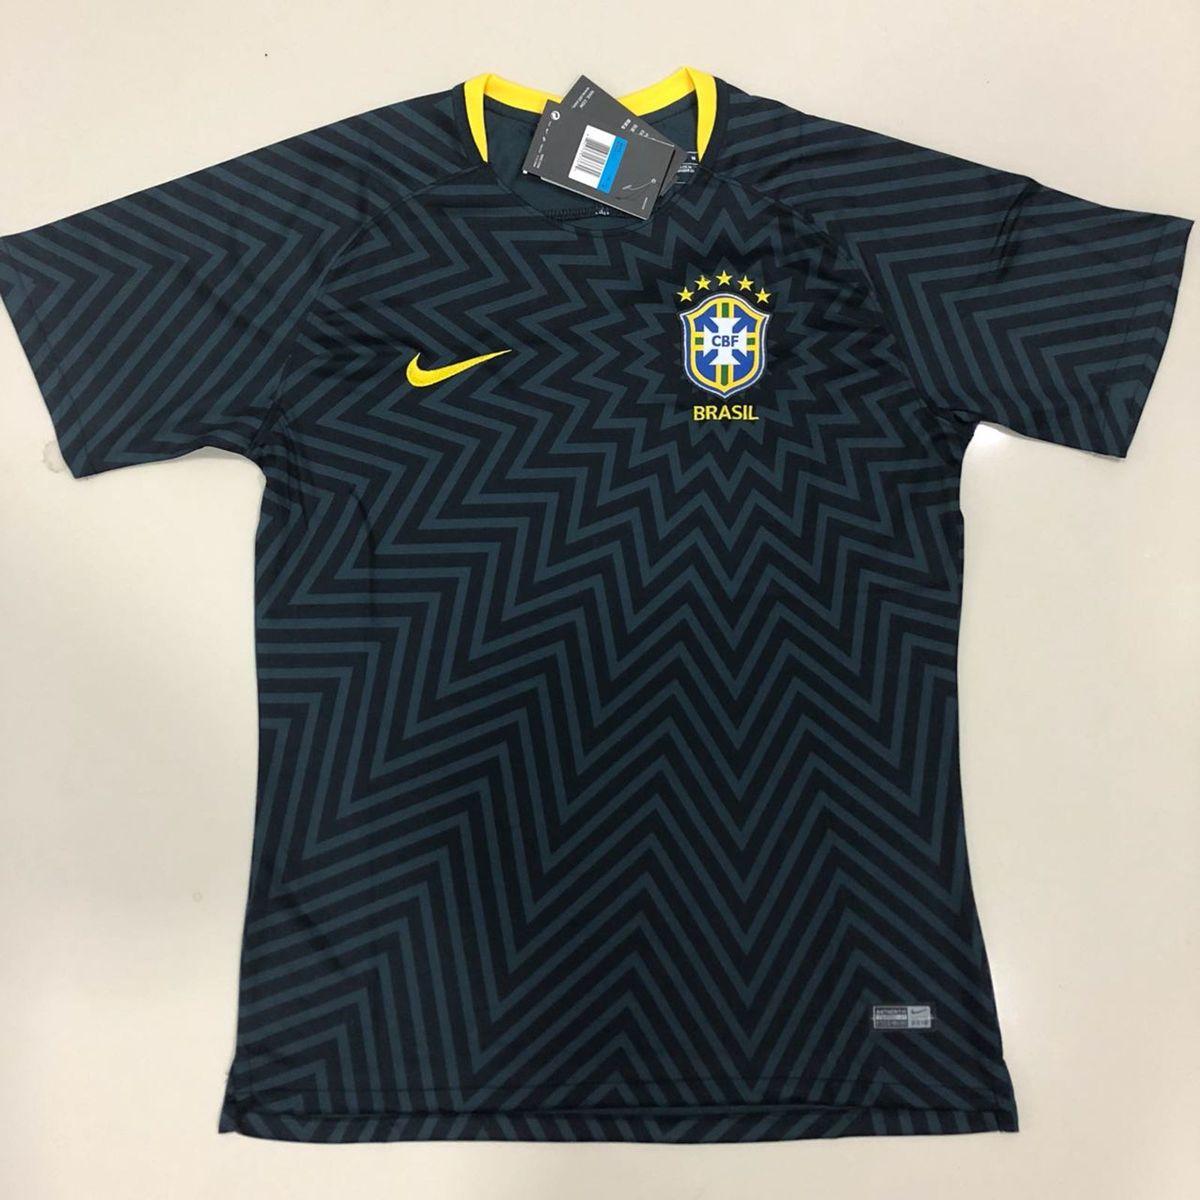 camisa do brasil treino preta importada pronta entrega - esportes nike 19bd73db9a4e7